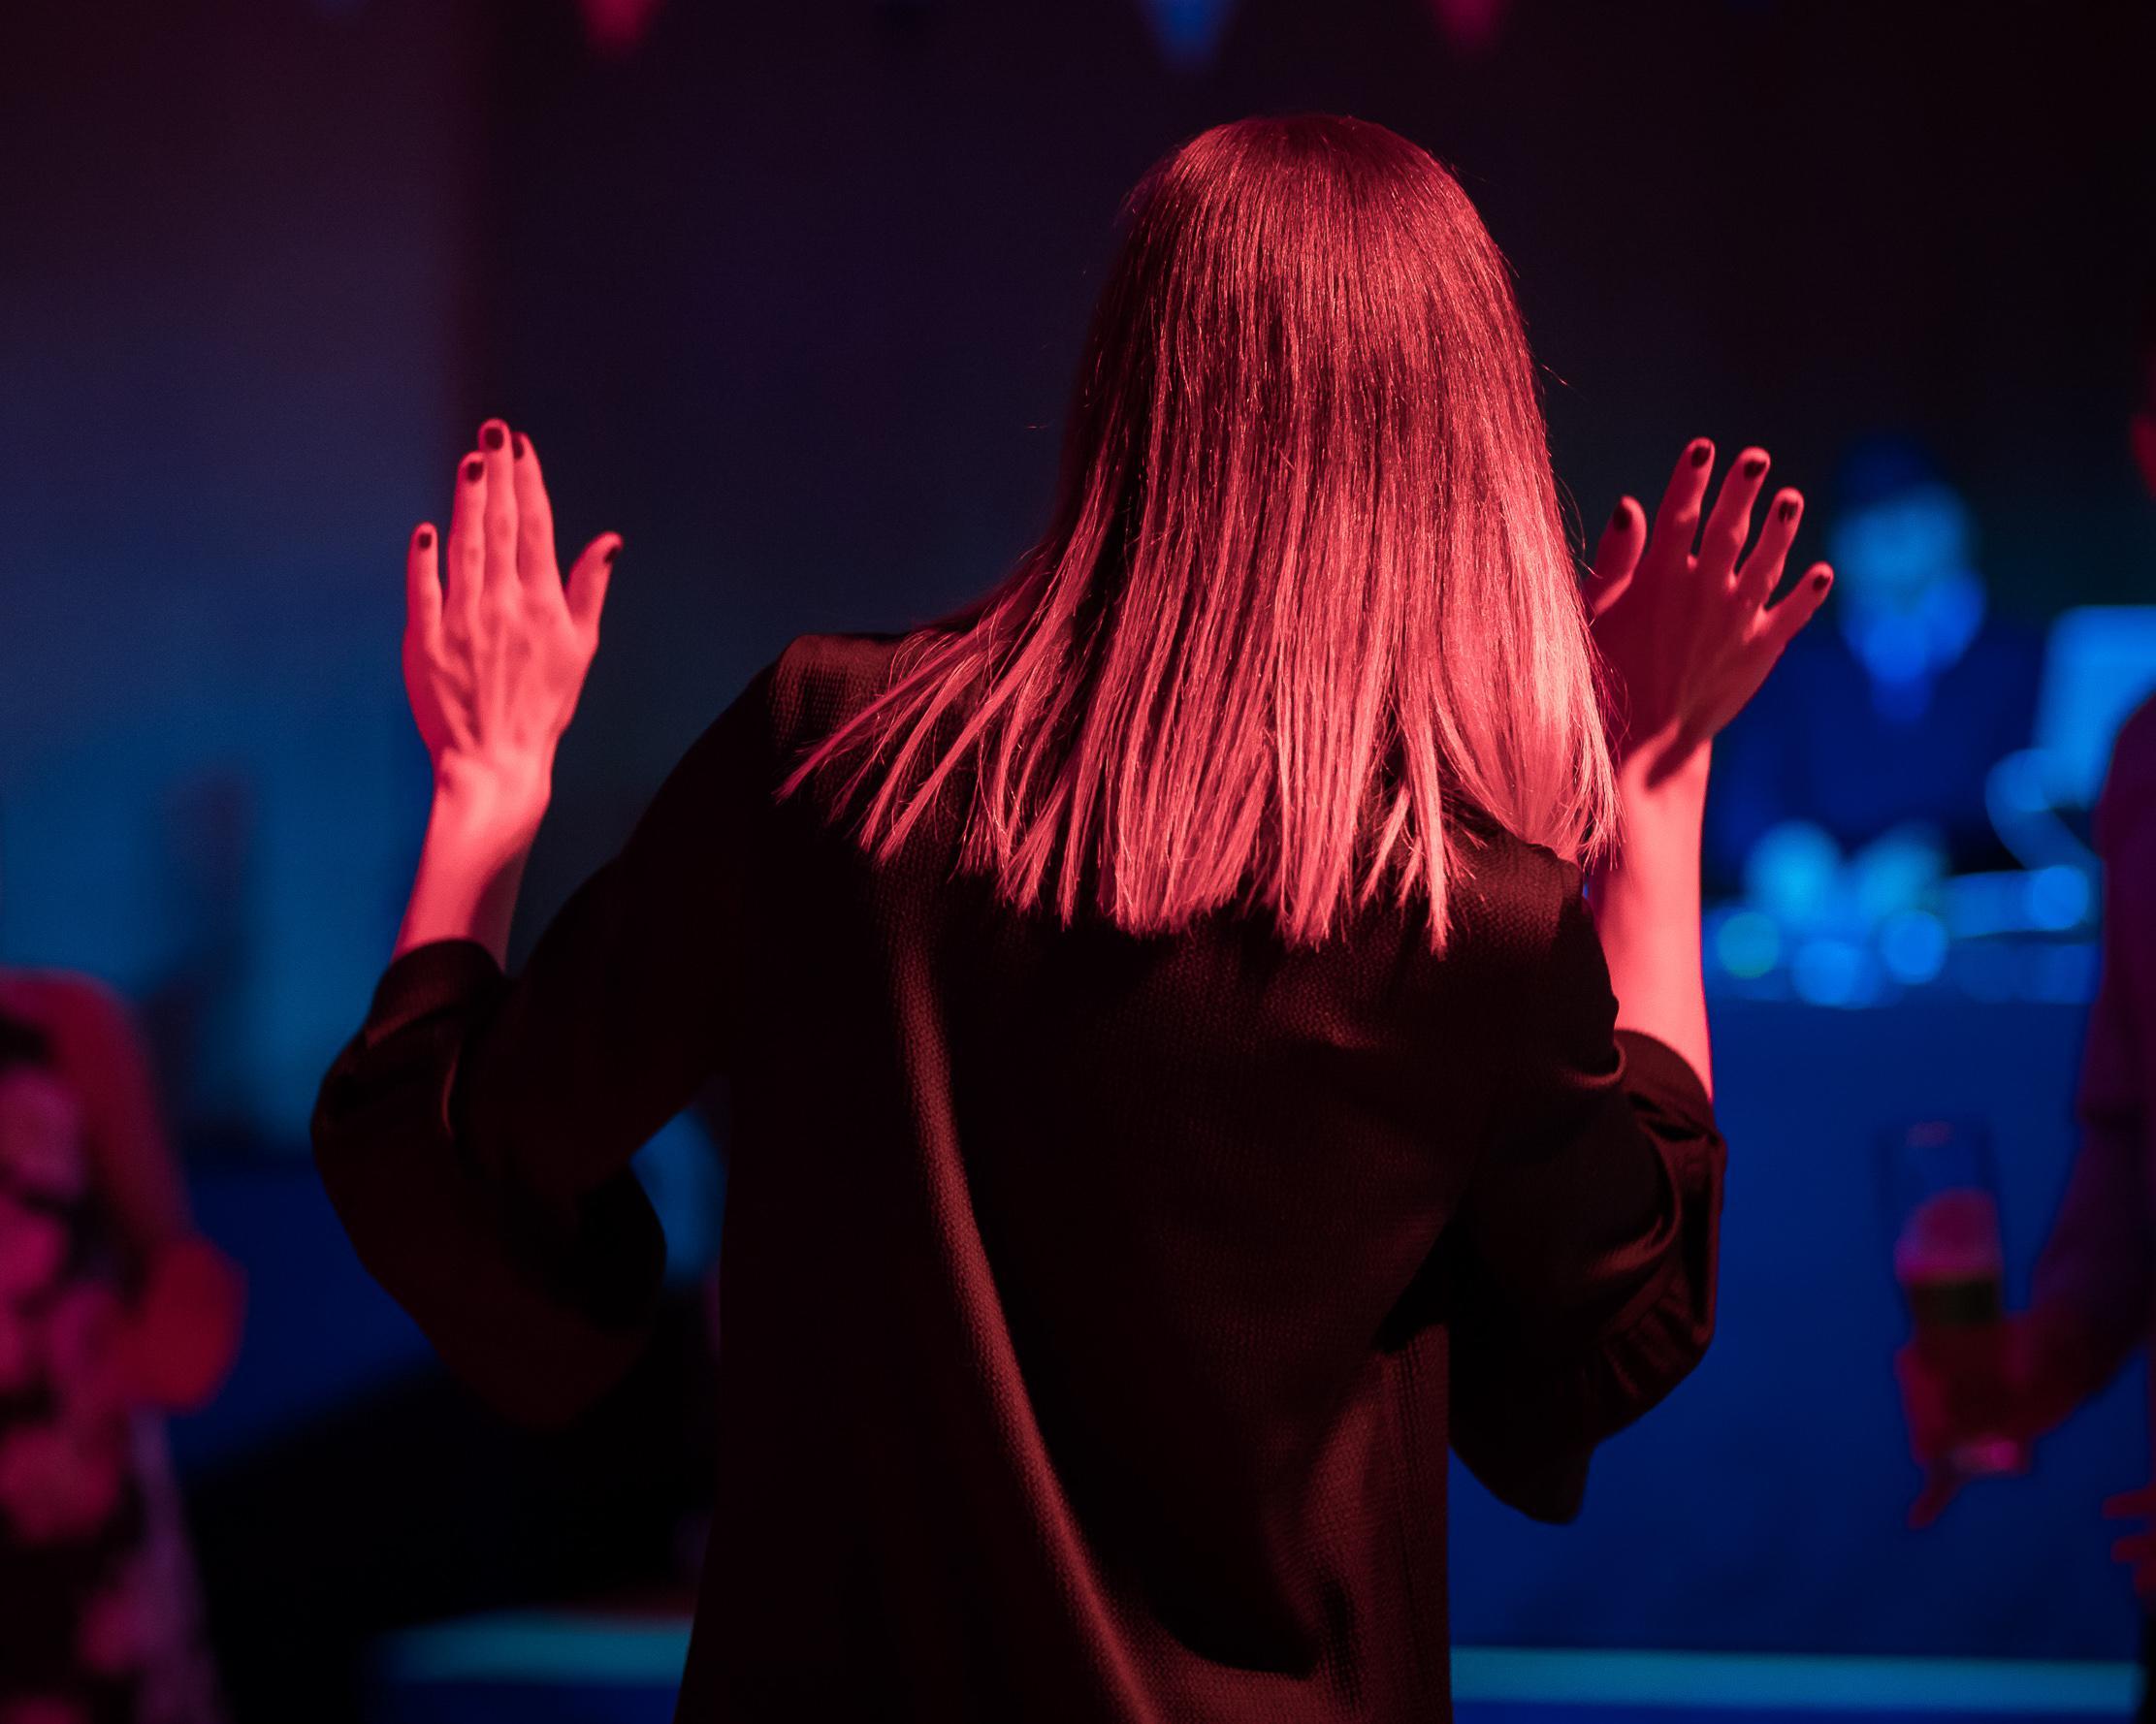 Woman raising hands